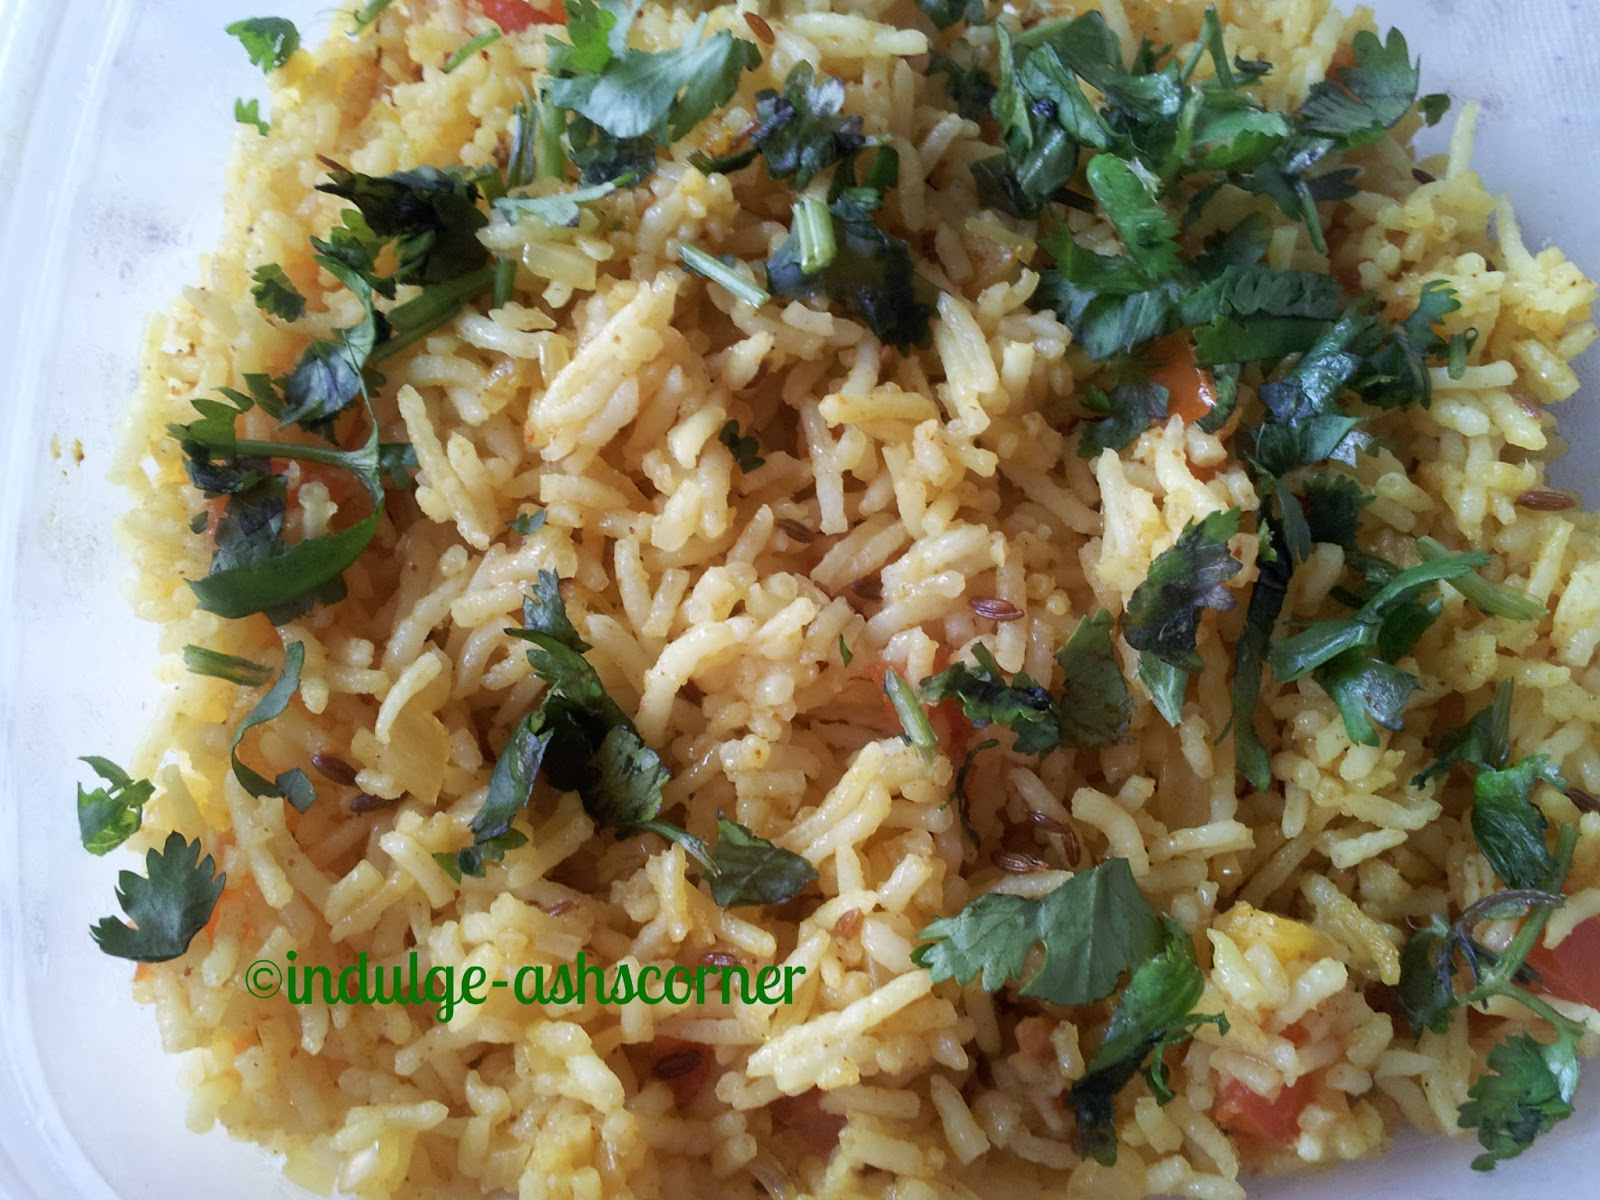 IndulgeAshscorner: Phodnicha Bhat- Tadka Rice-Kids School ...